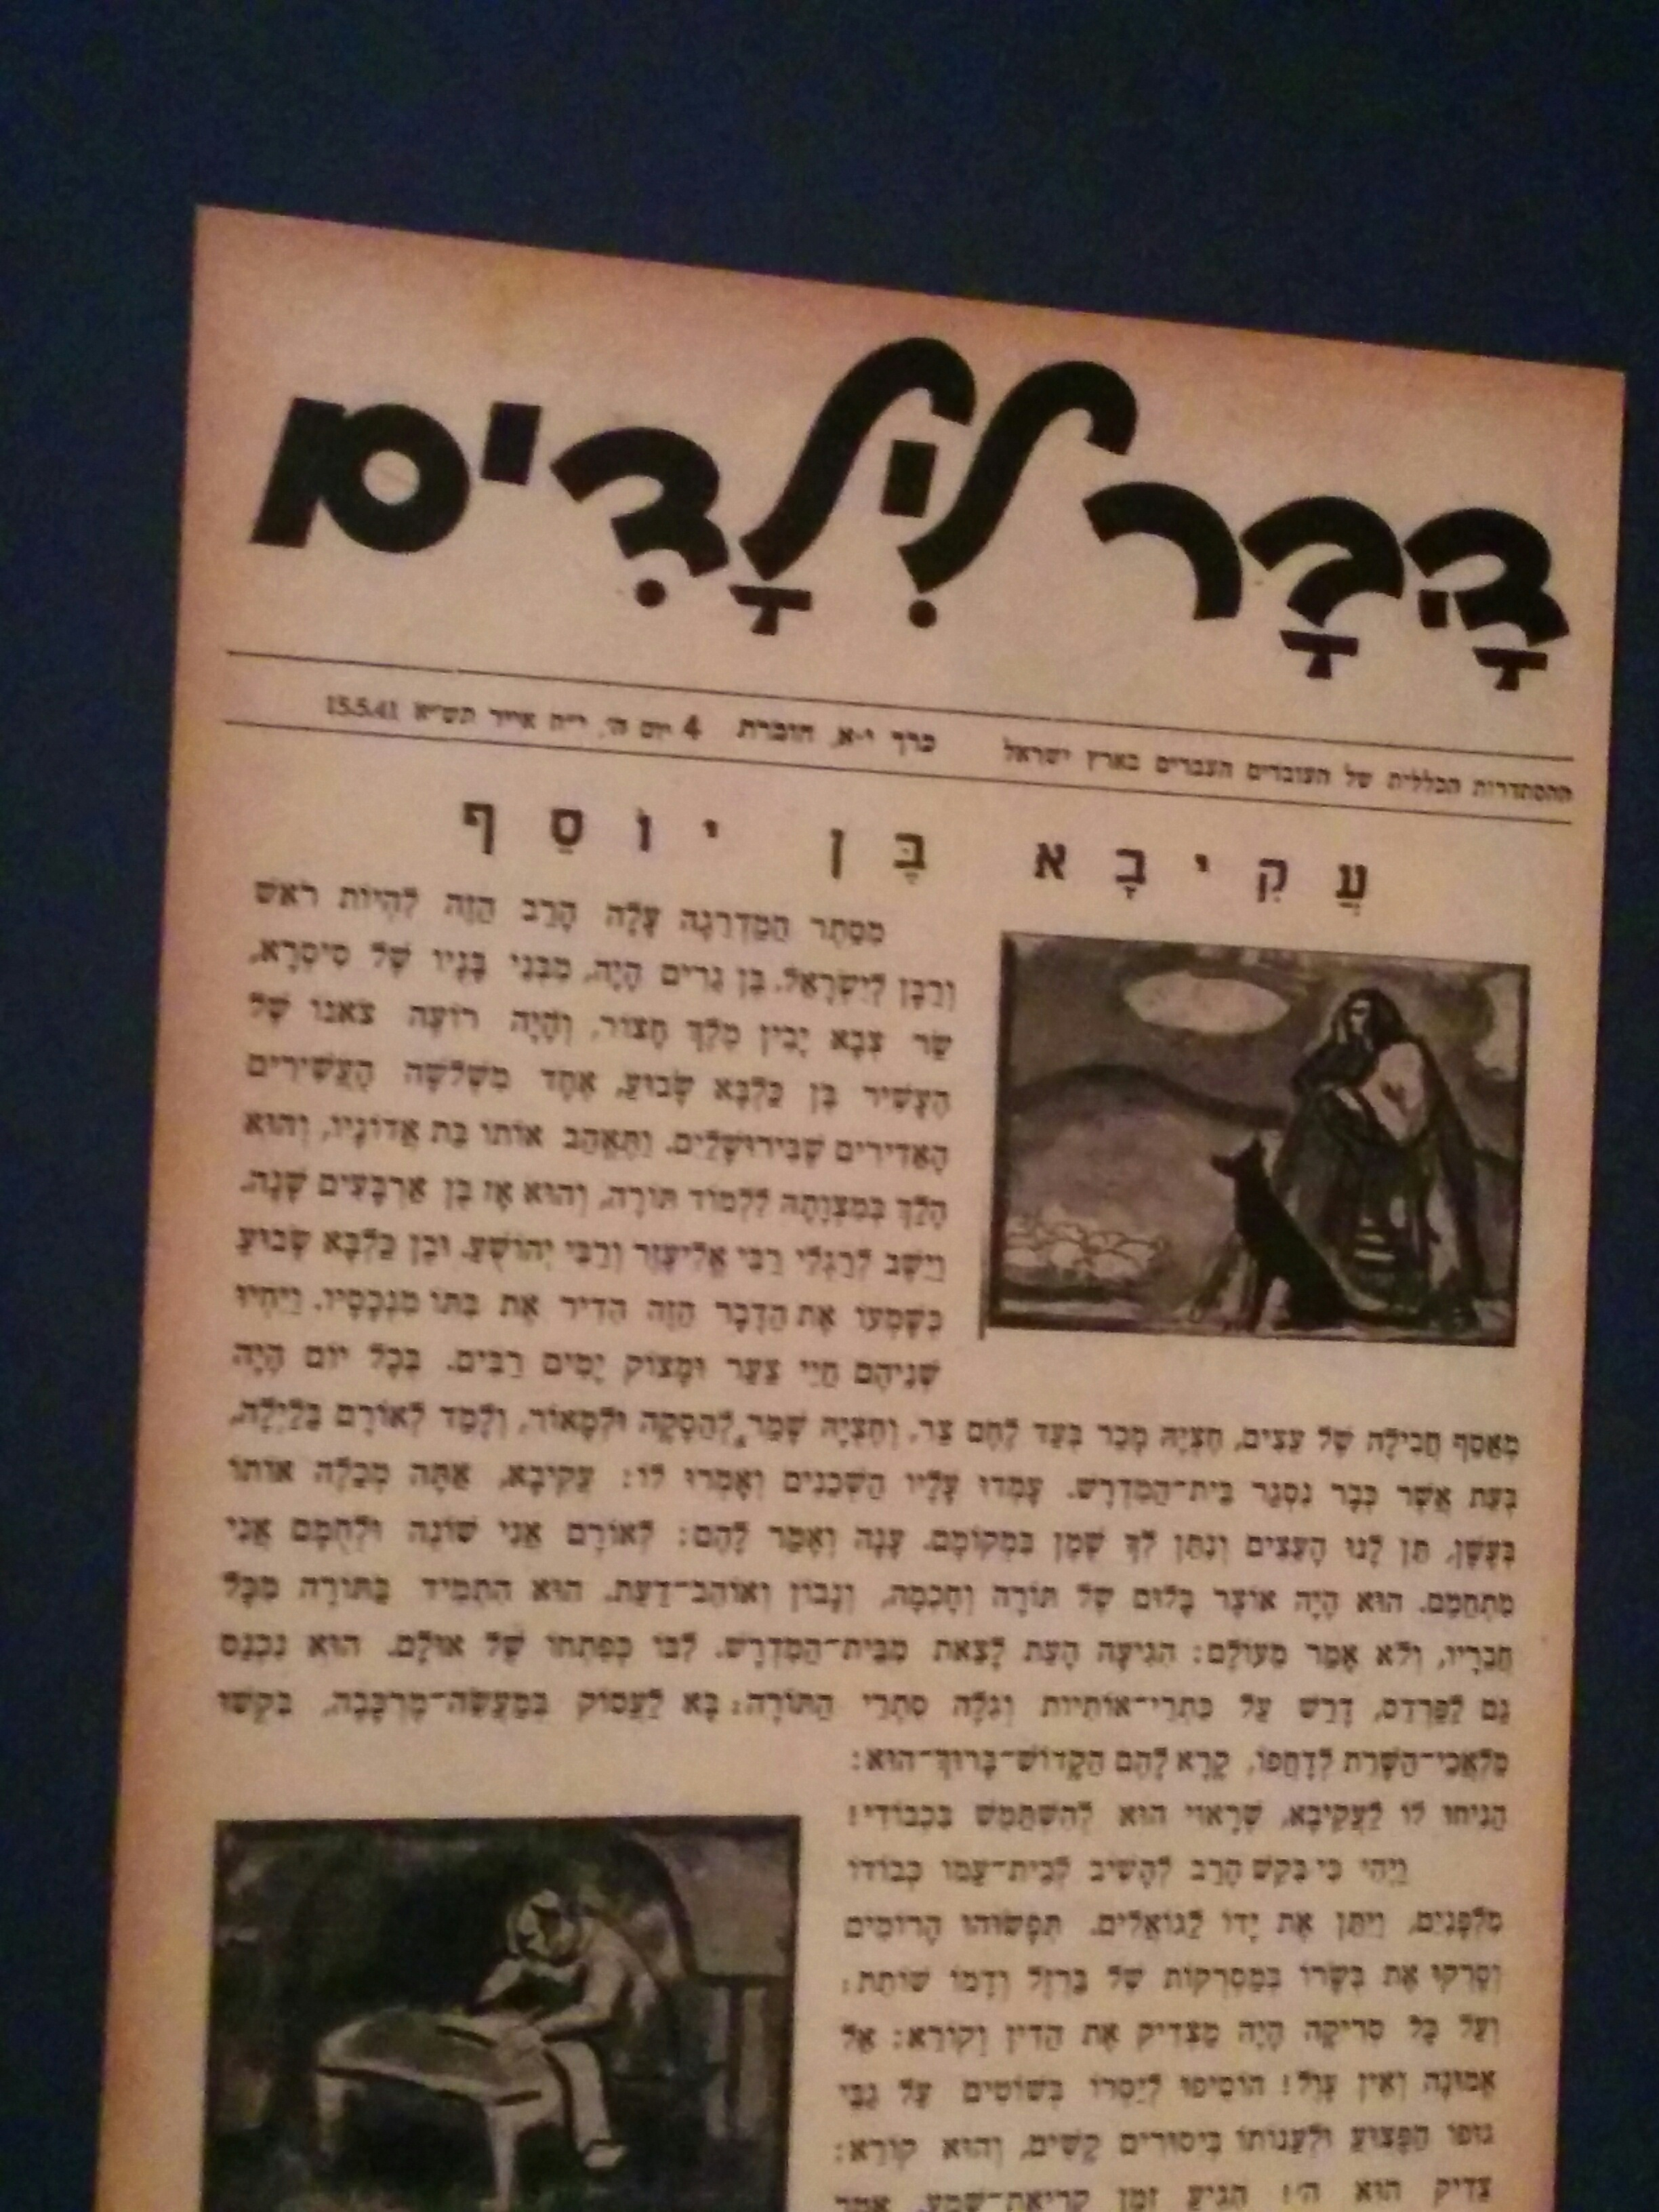 Bar Kokhba in childrens magazine - Shimon Bar Kokhba - Eretz Israel Museum